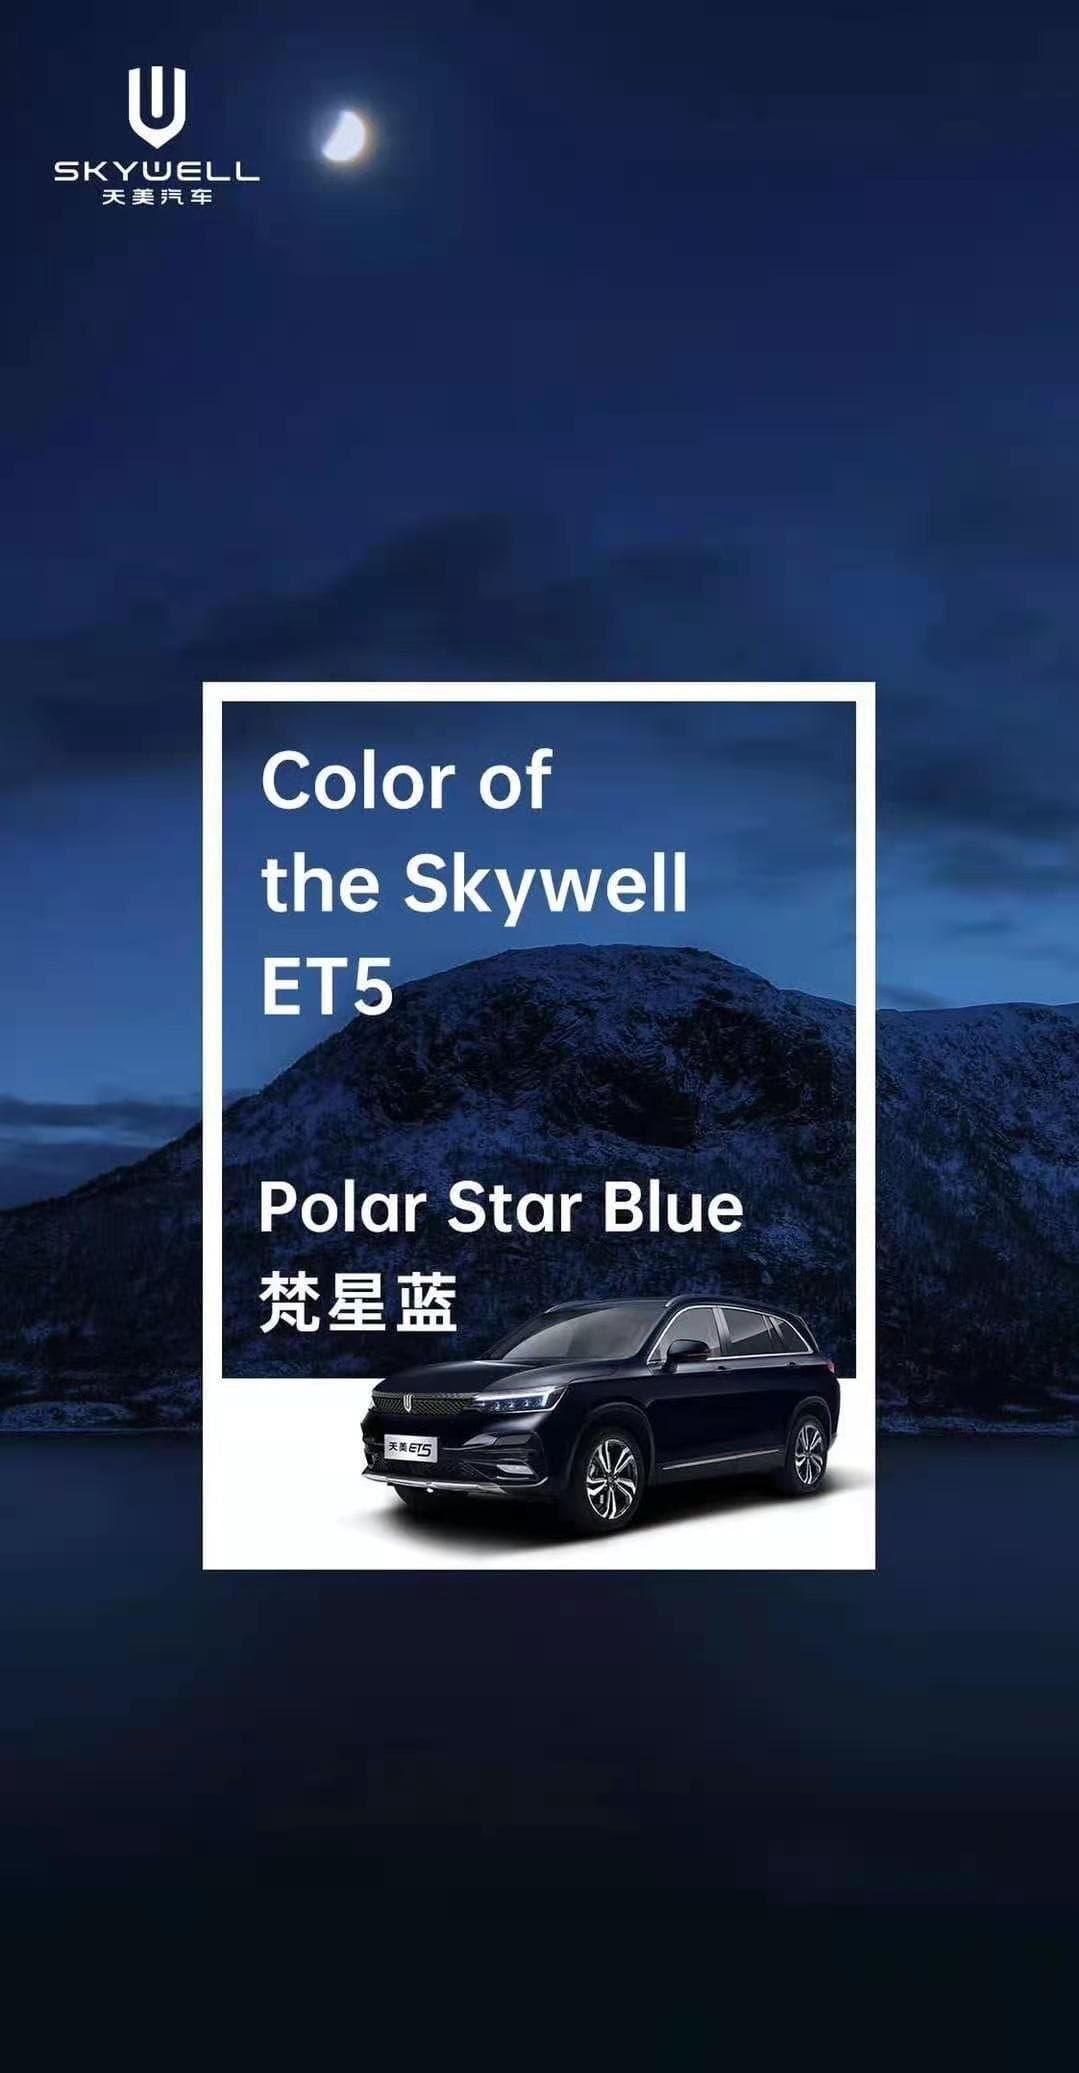 Polar Star Blue ET5